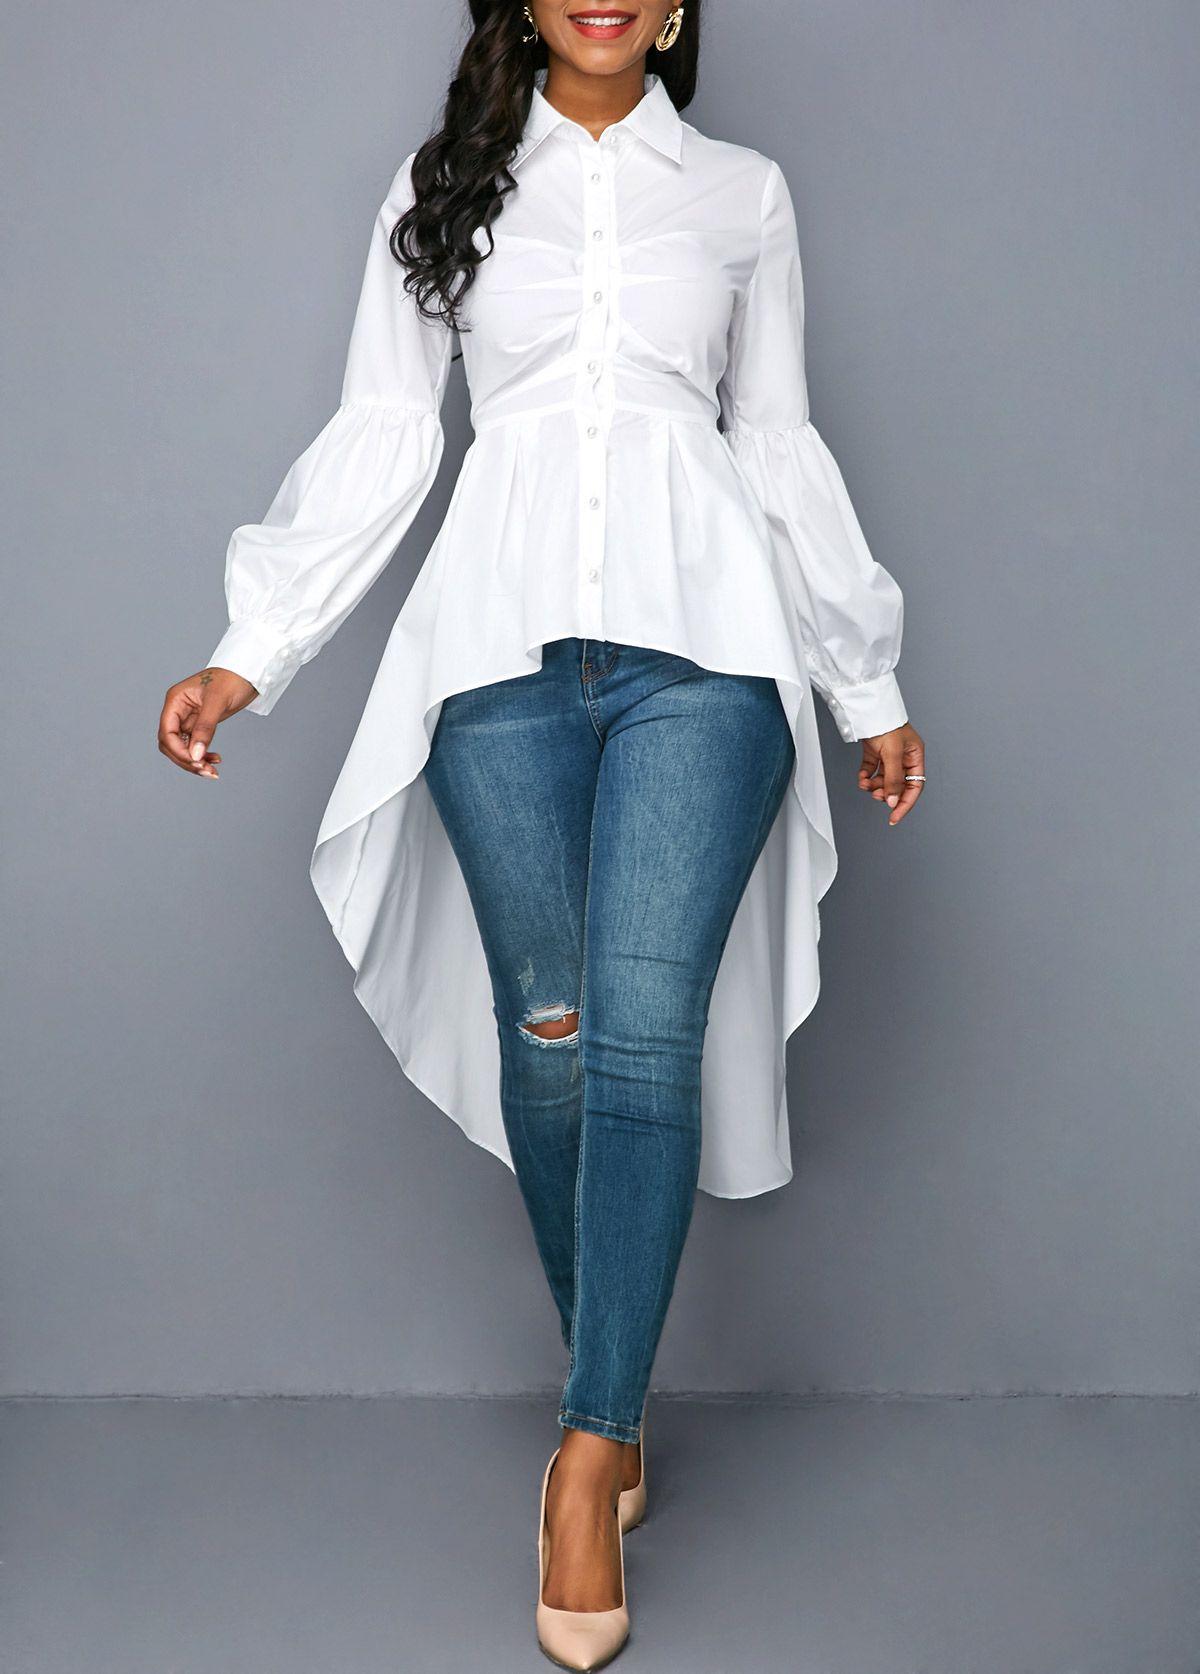 Pin on White blouse